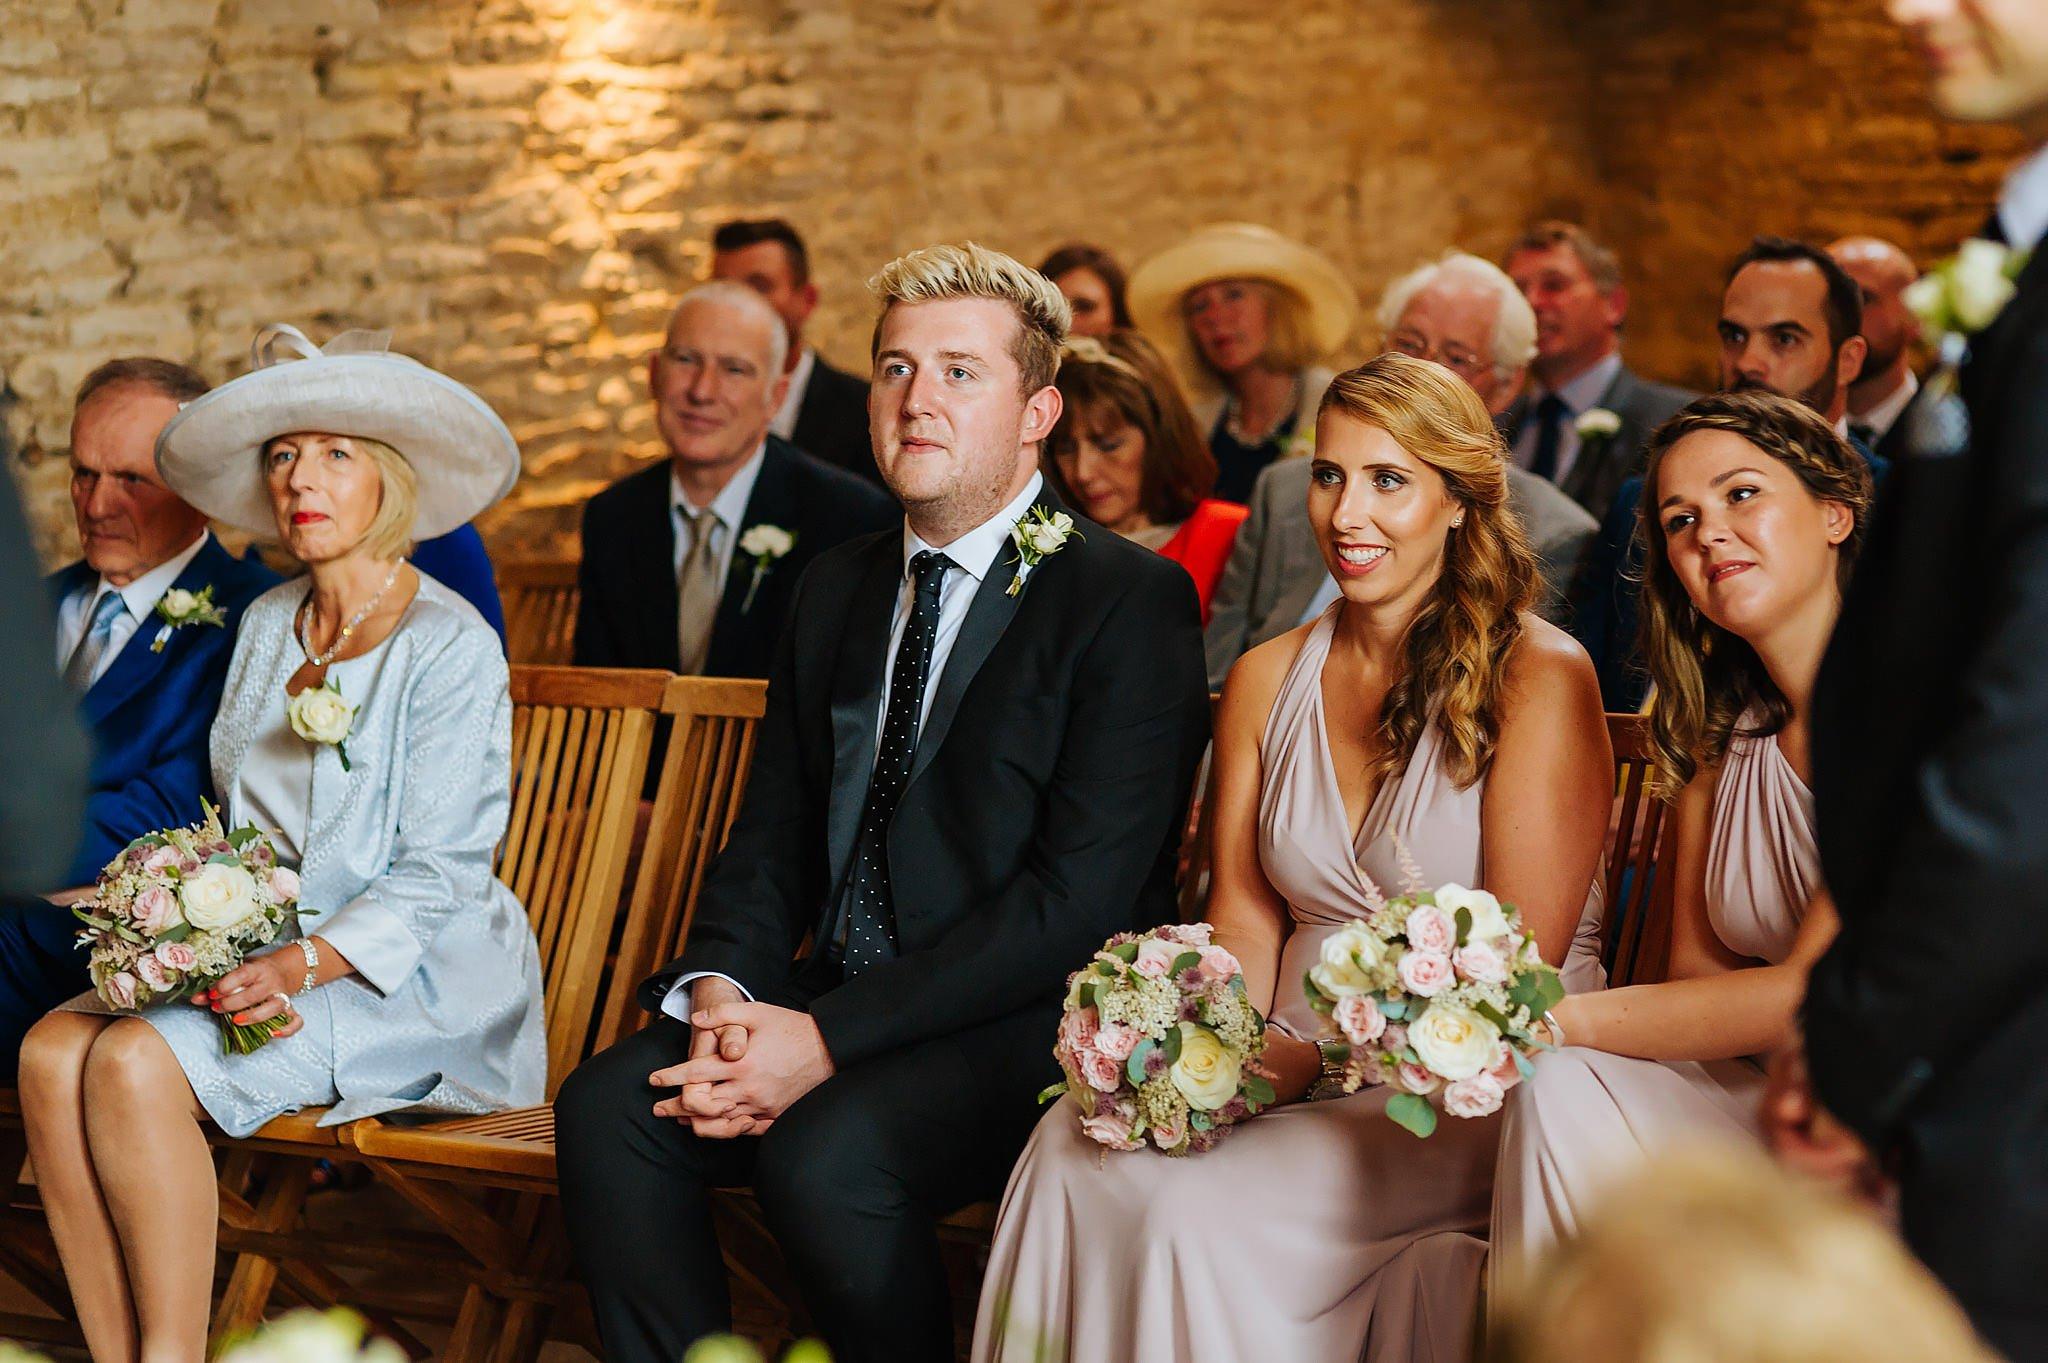 stone-barn-wedding-cotswolds (38)